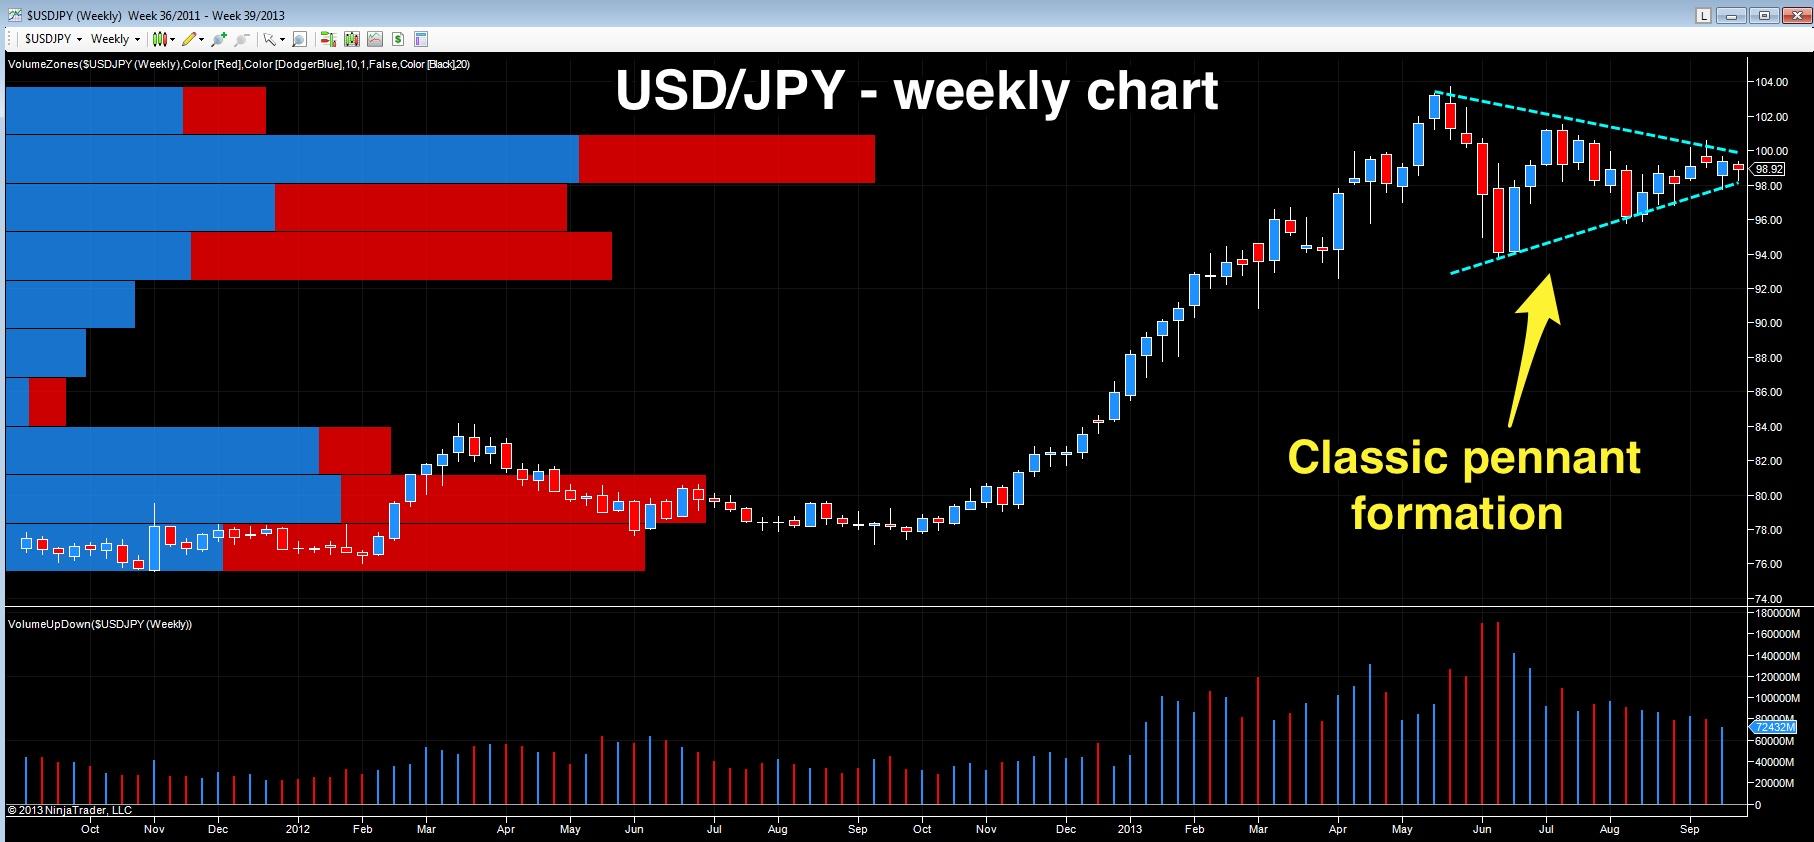 USD/JPY - weekly chart